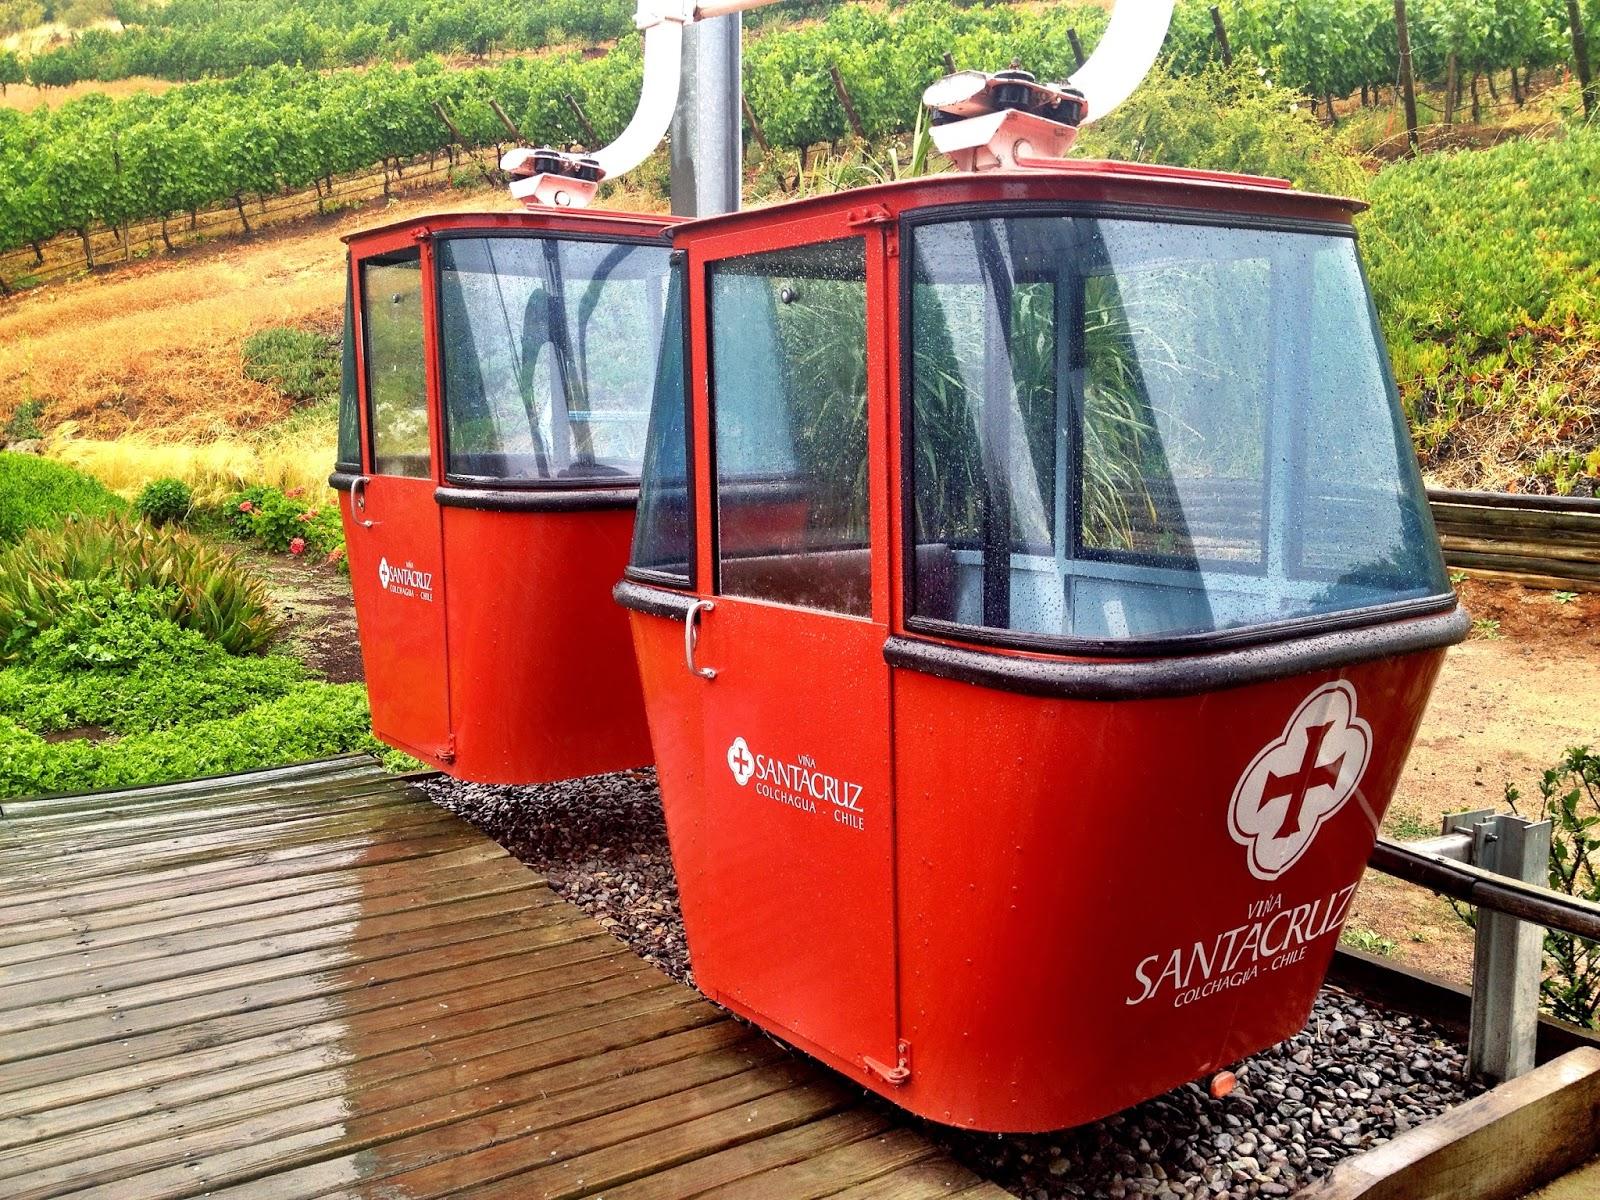 Santa Cruz winery - funicular